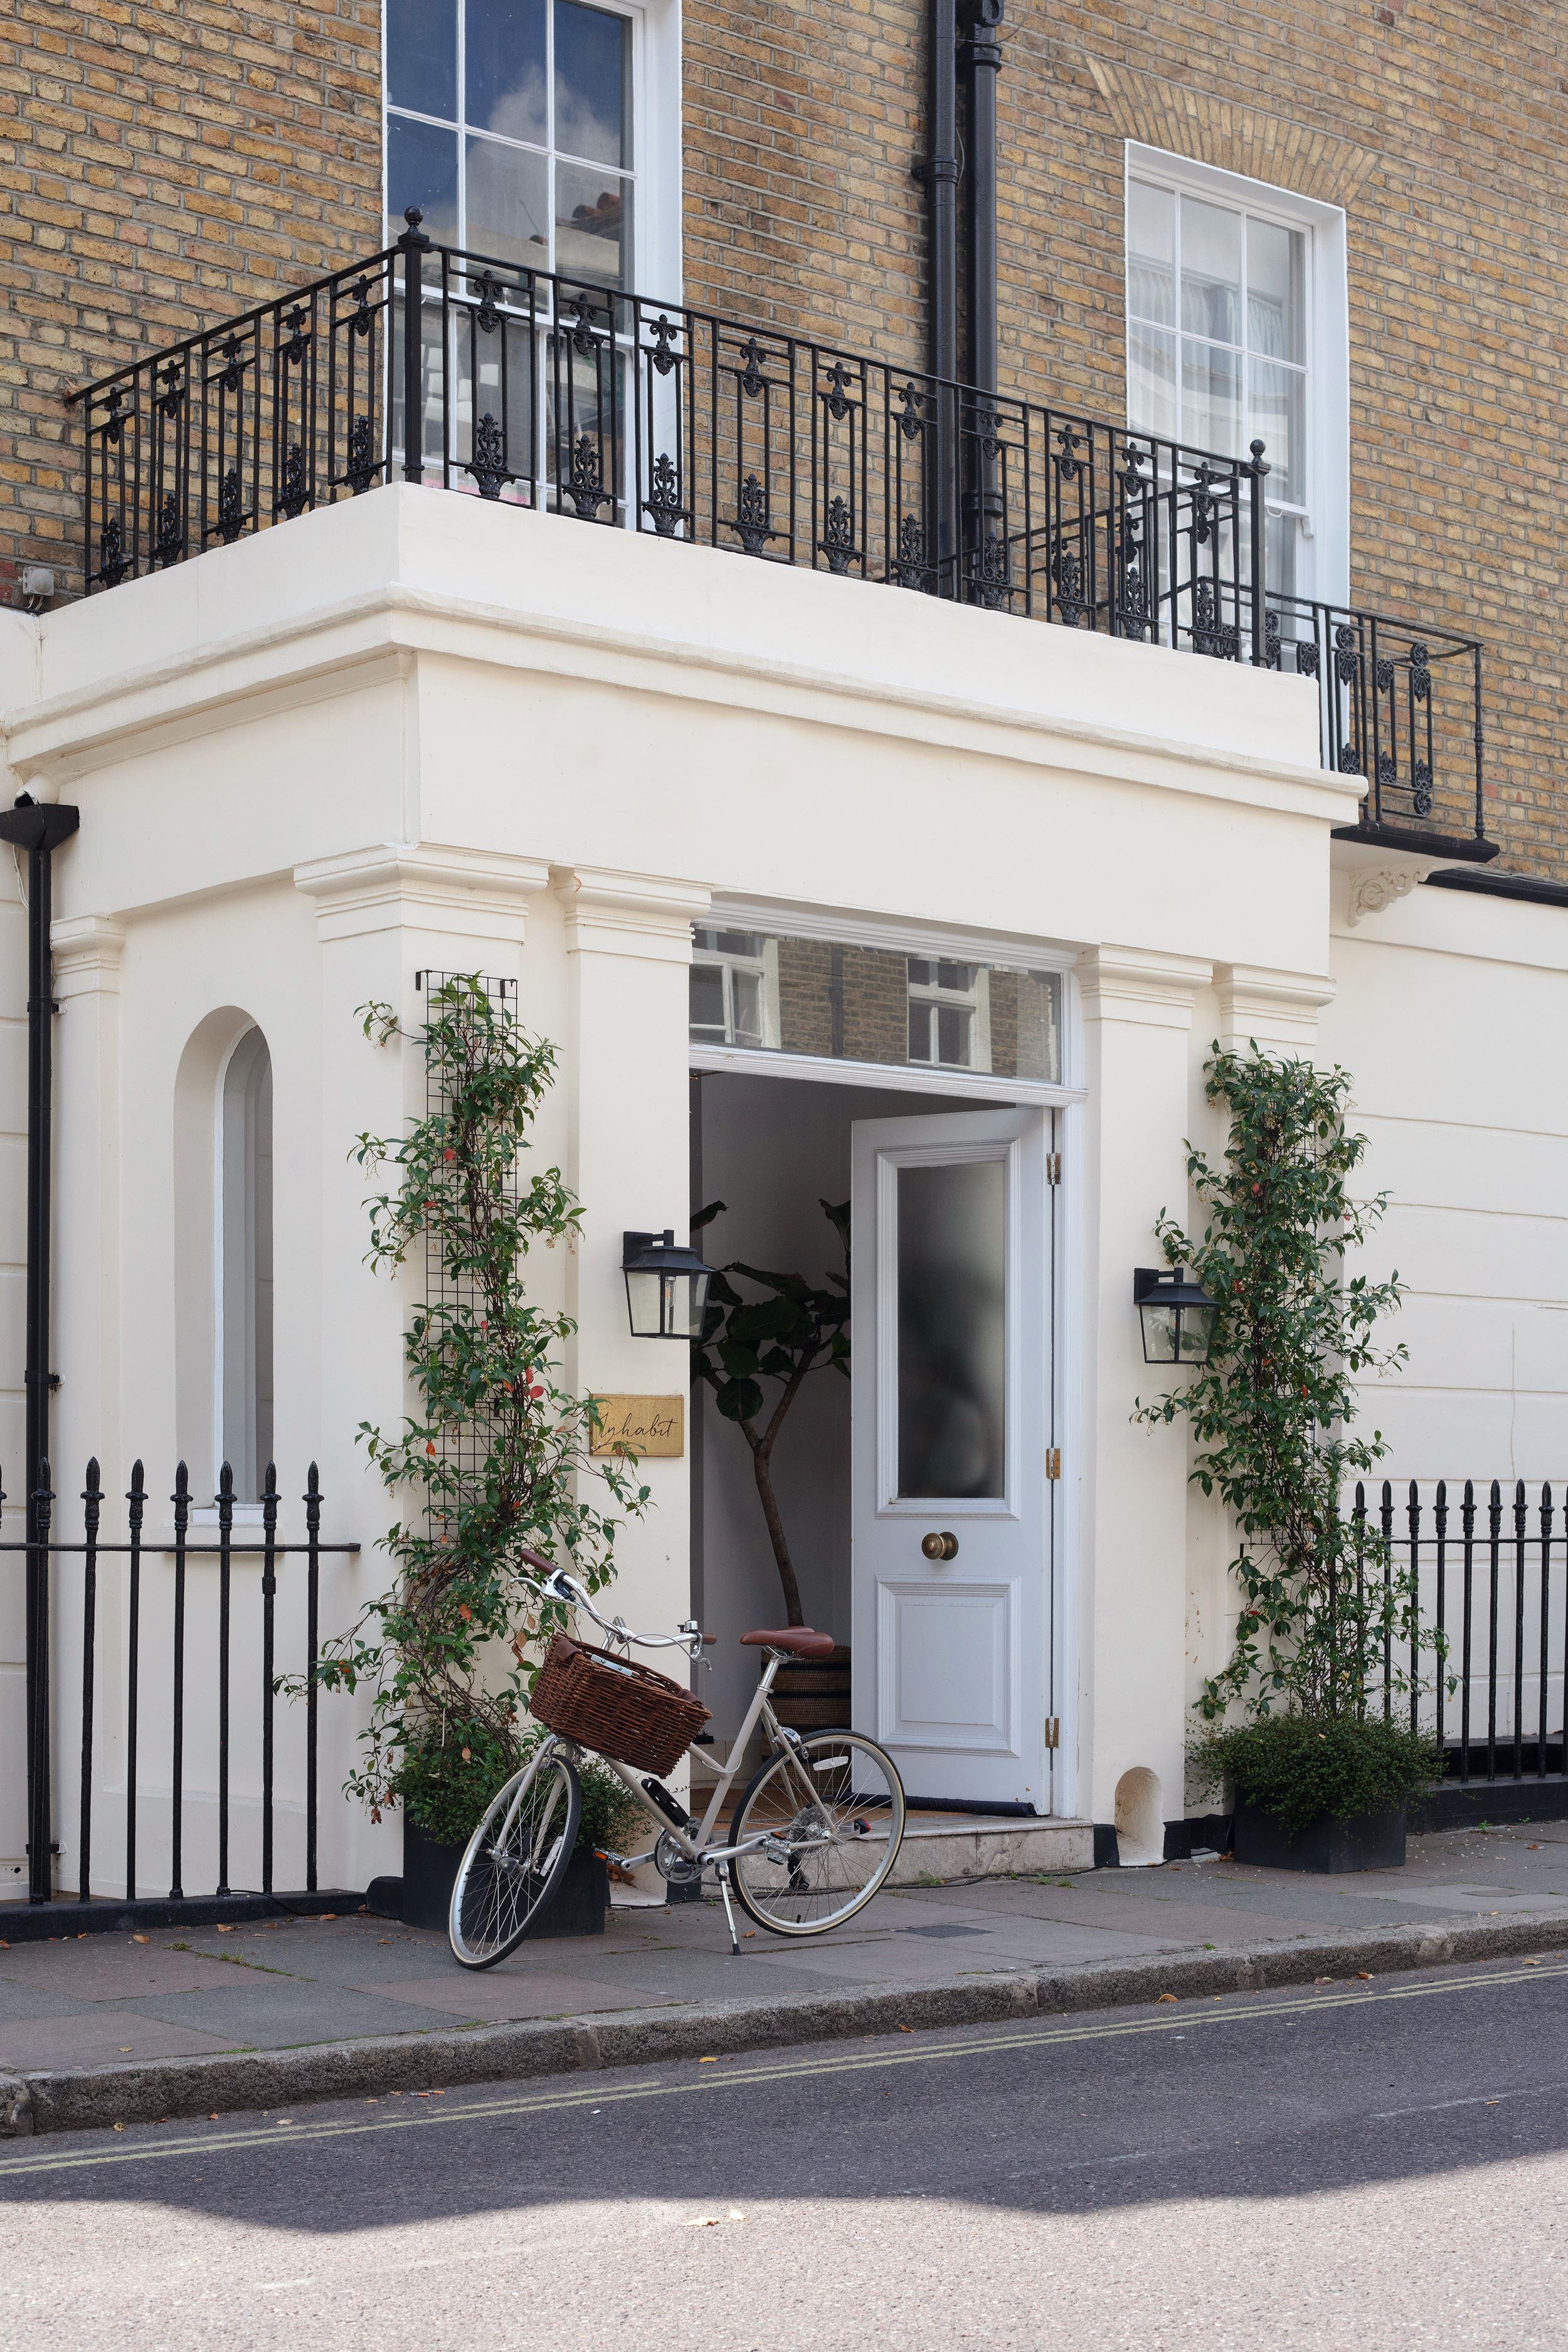 Inhabit Hotel - Urban wellness hotel London